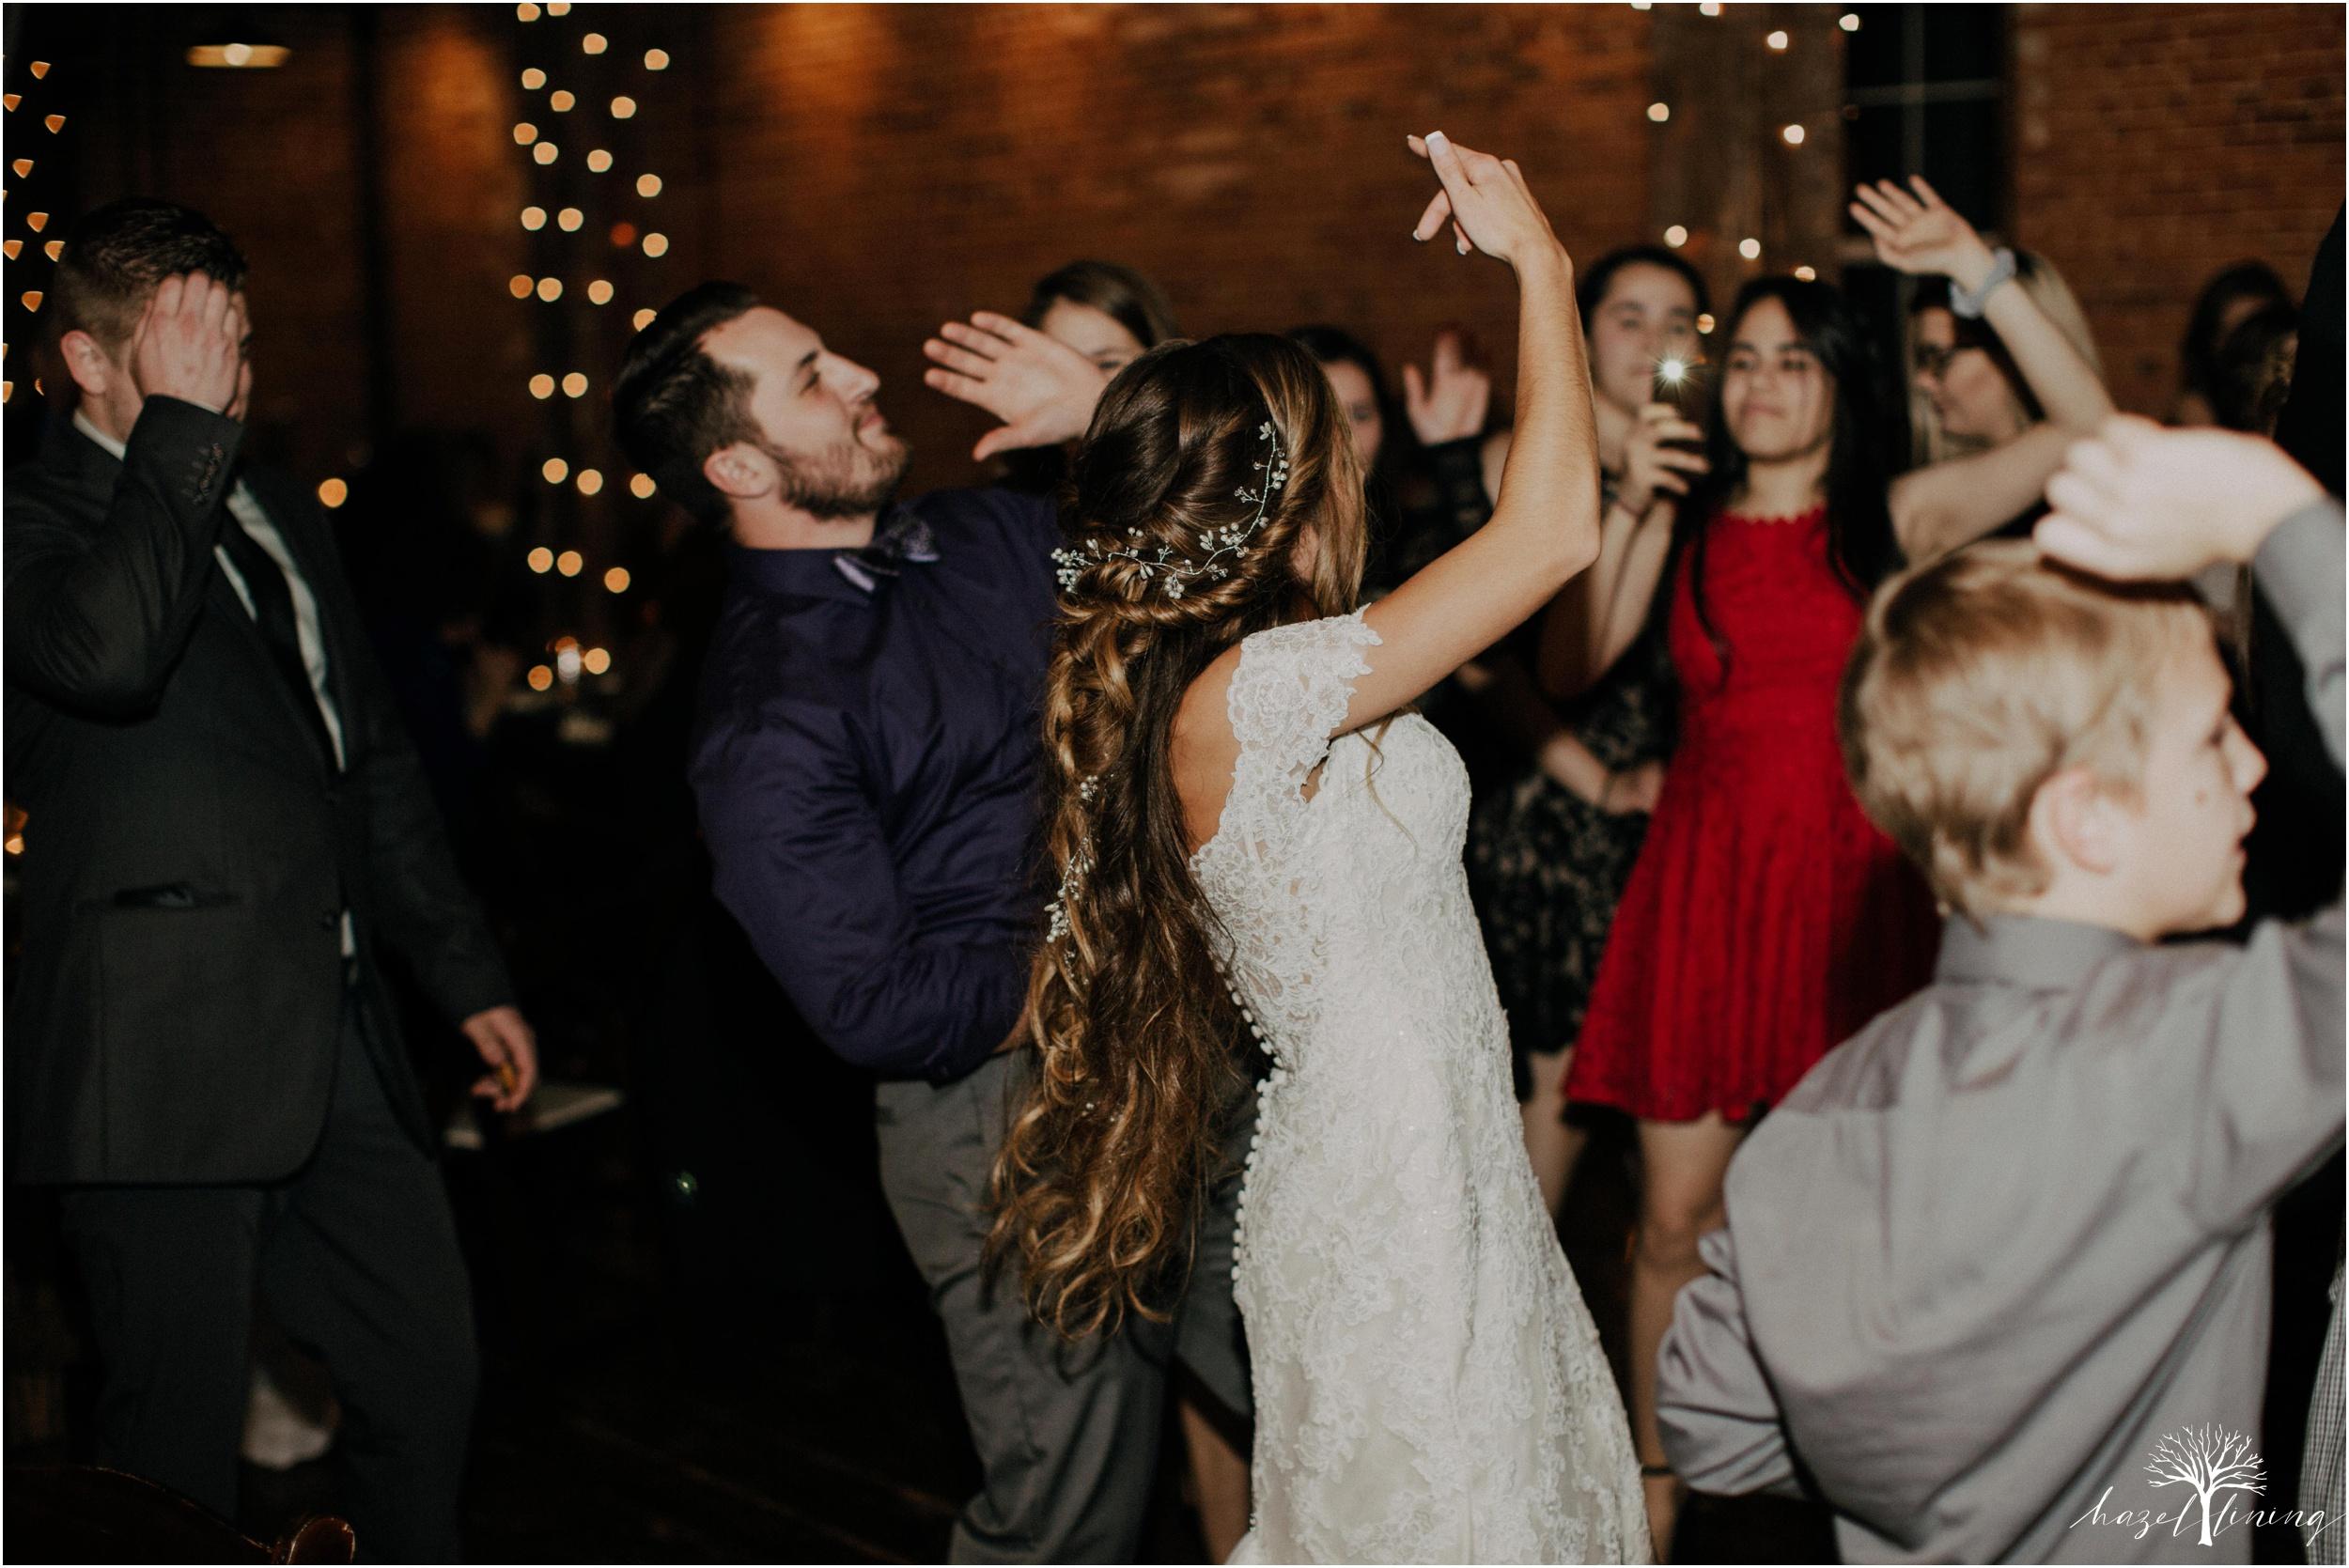 emma-matt-gehringer-the-booking-house-lancaster-manhiem-pennsylvania-winter-wedding_0181.jpg